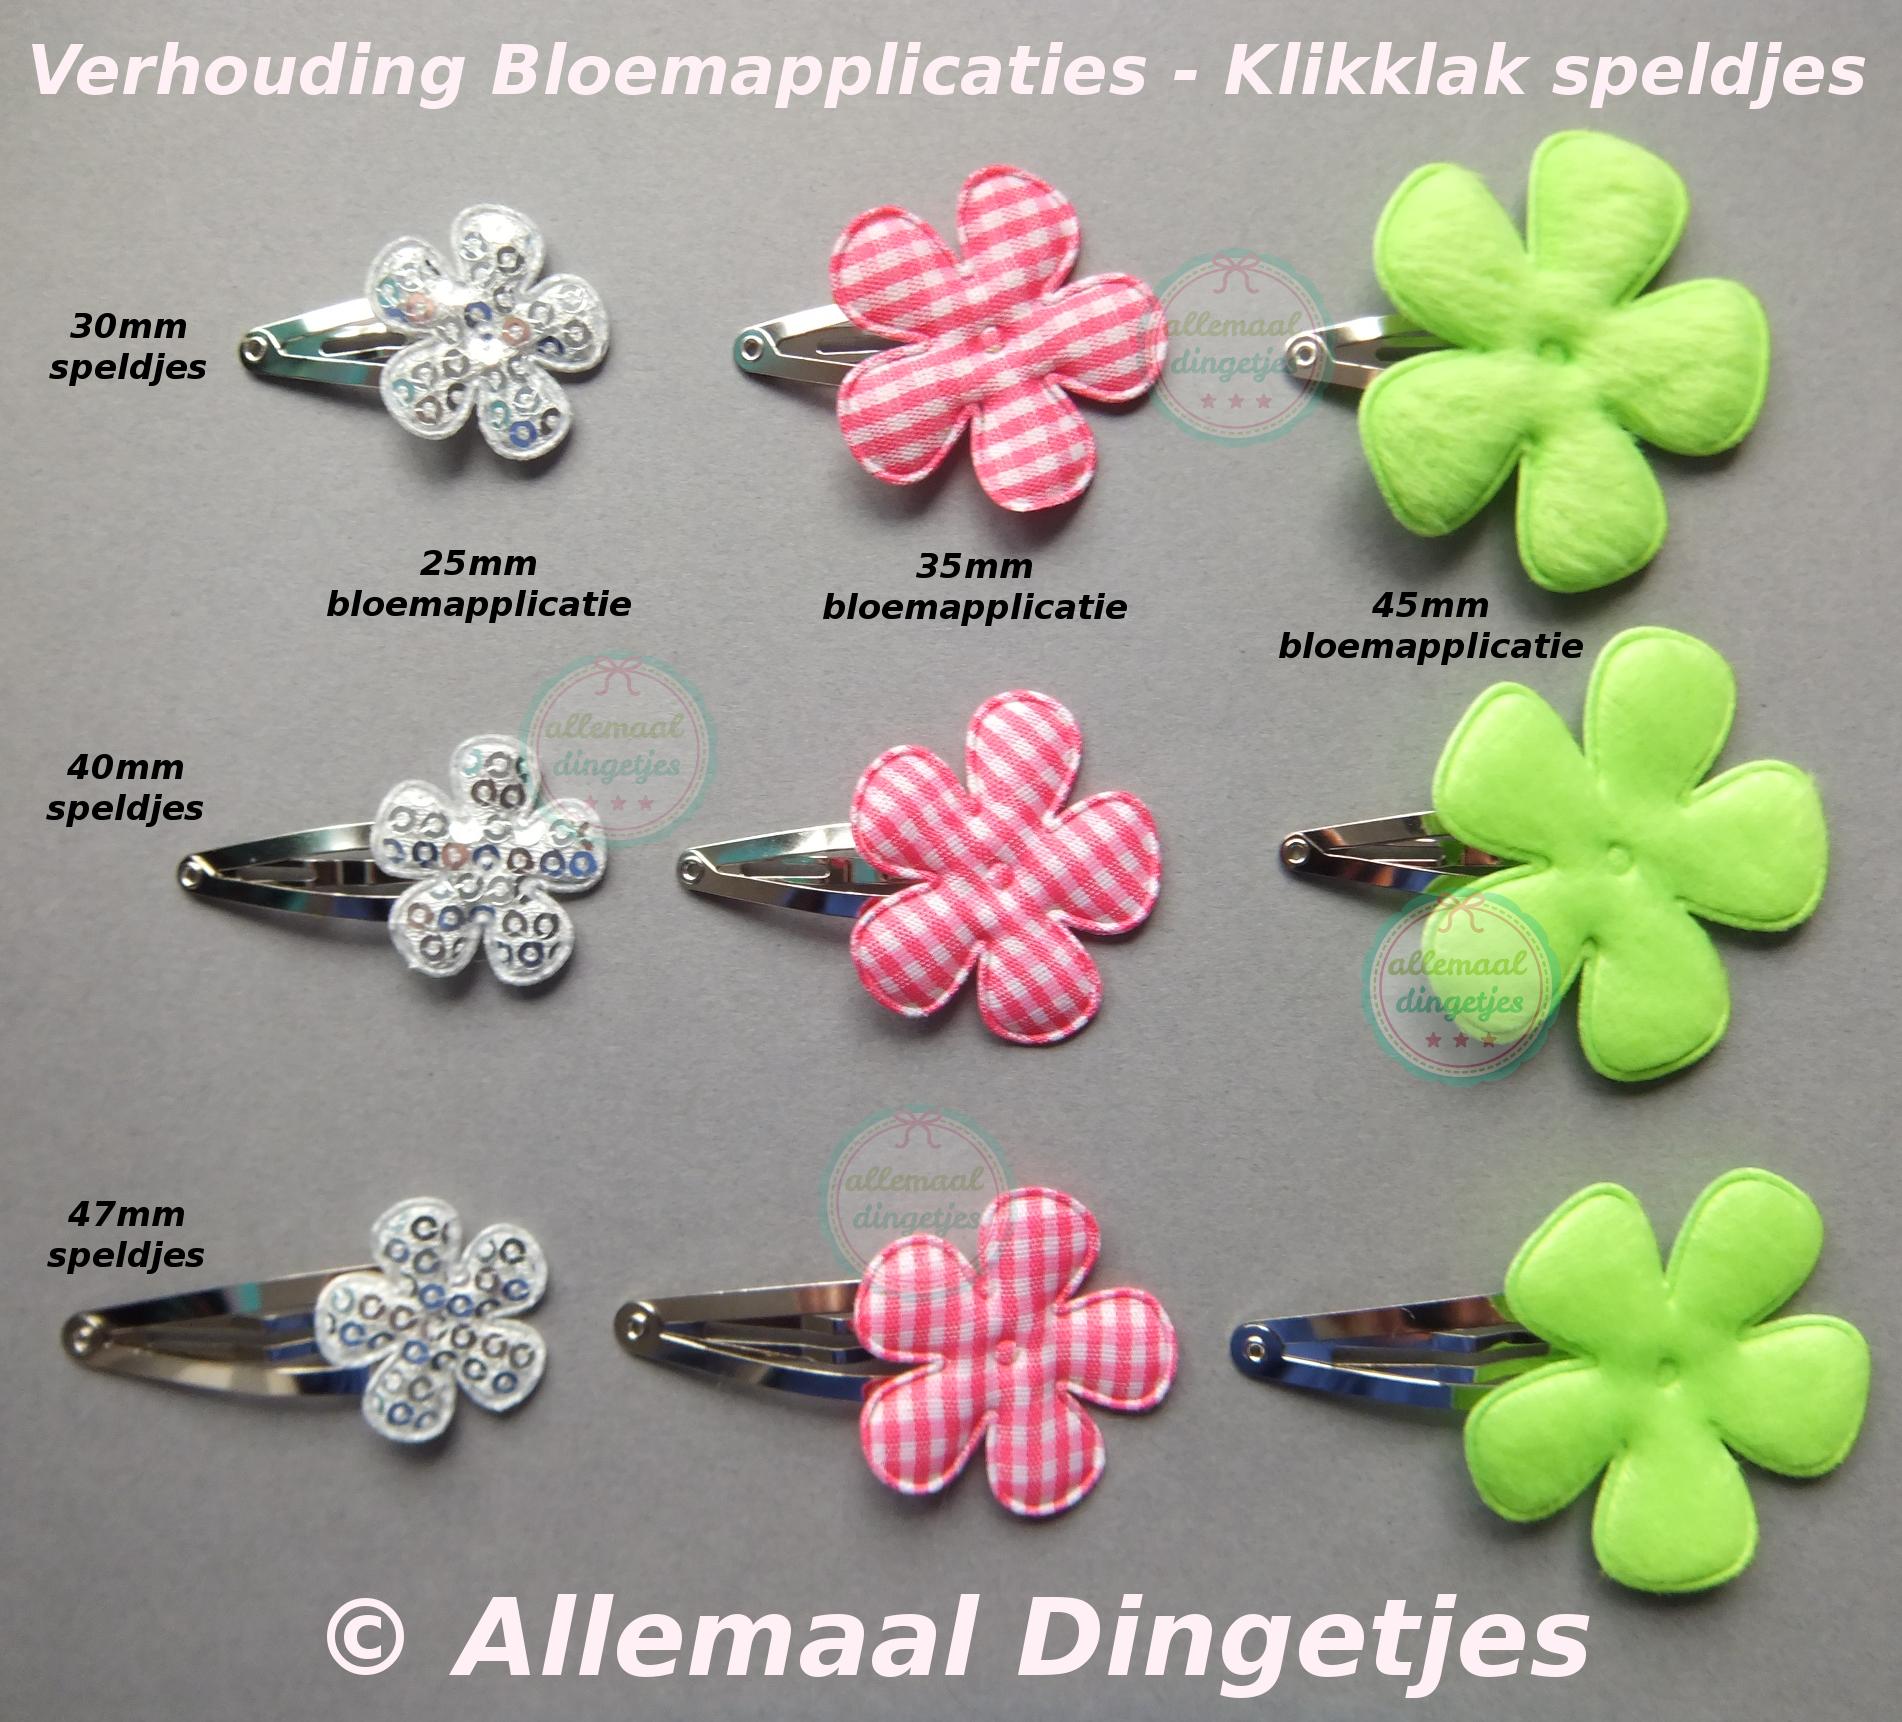 Verhouding bloemapplicaties t.o.v. klikklak speldjes